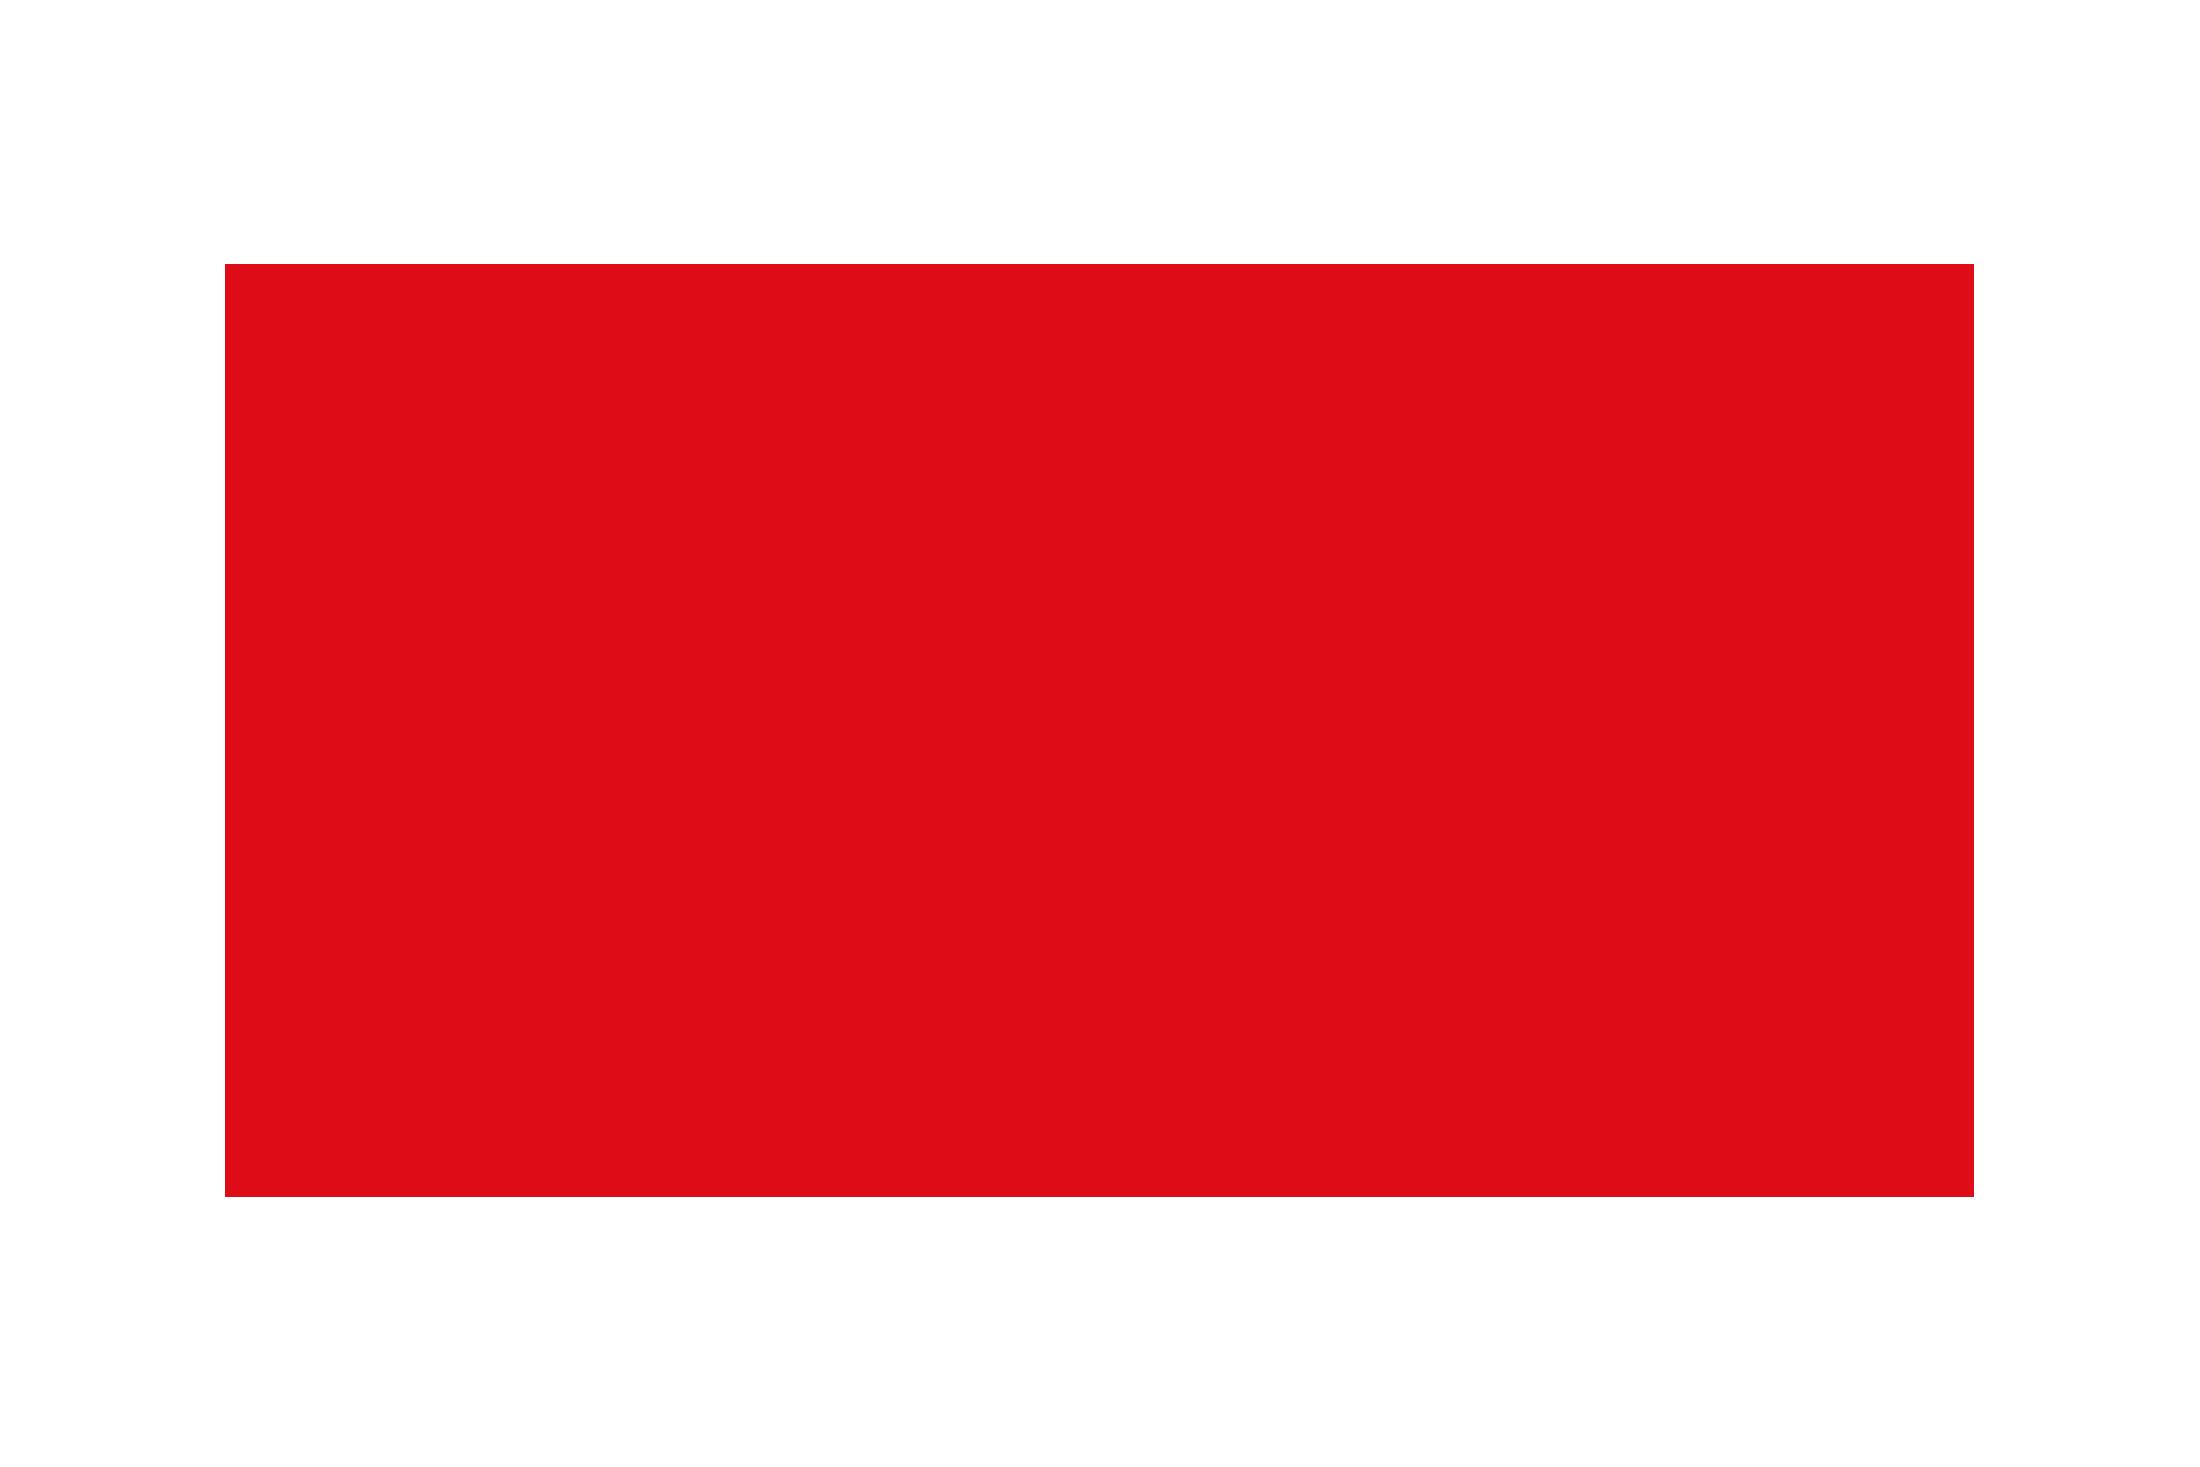 Grunge 100 percent label PSD